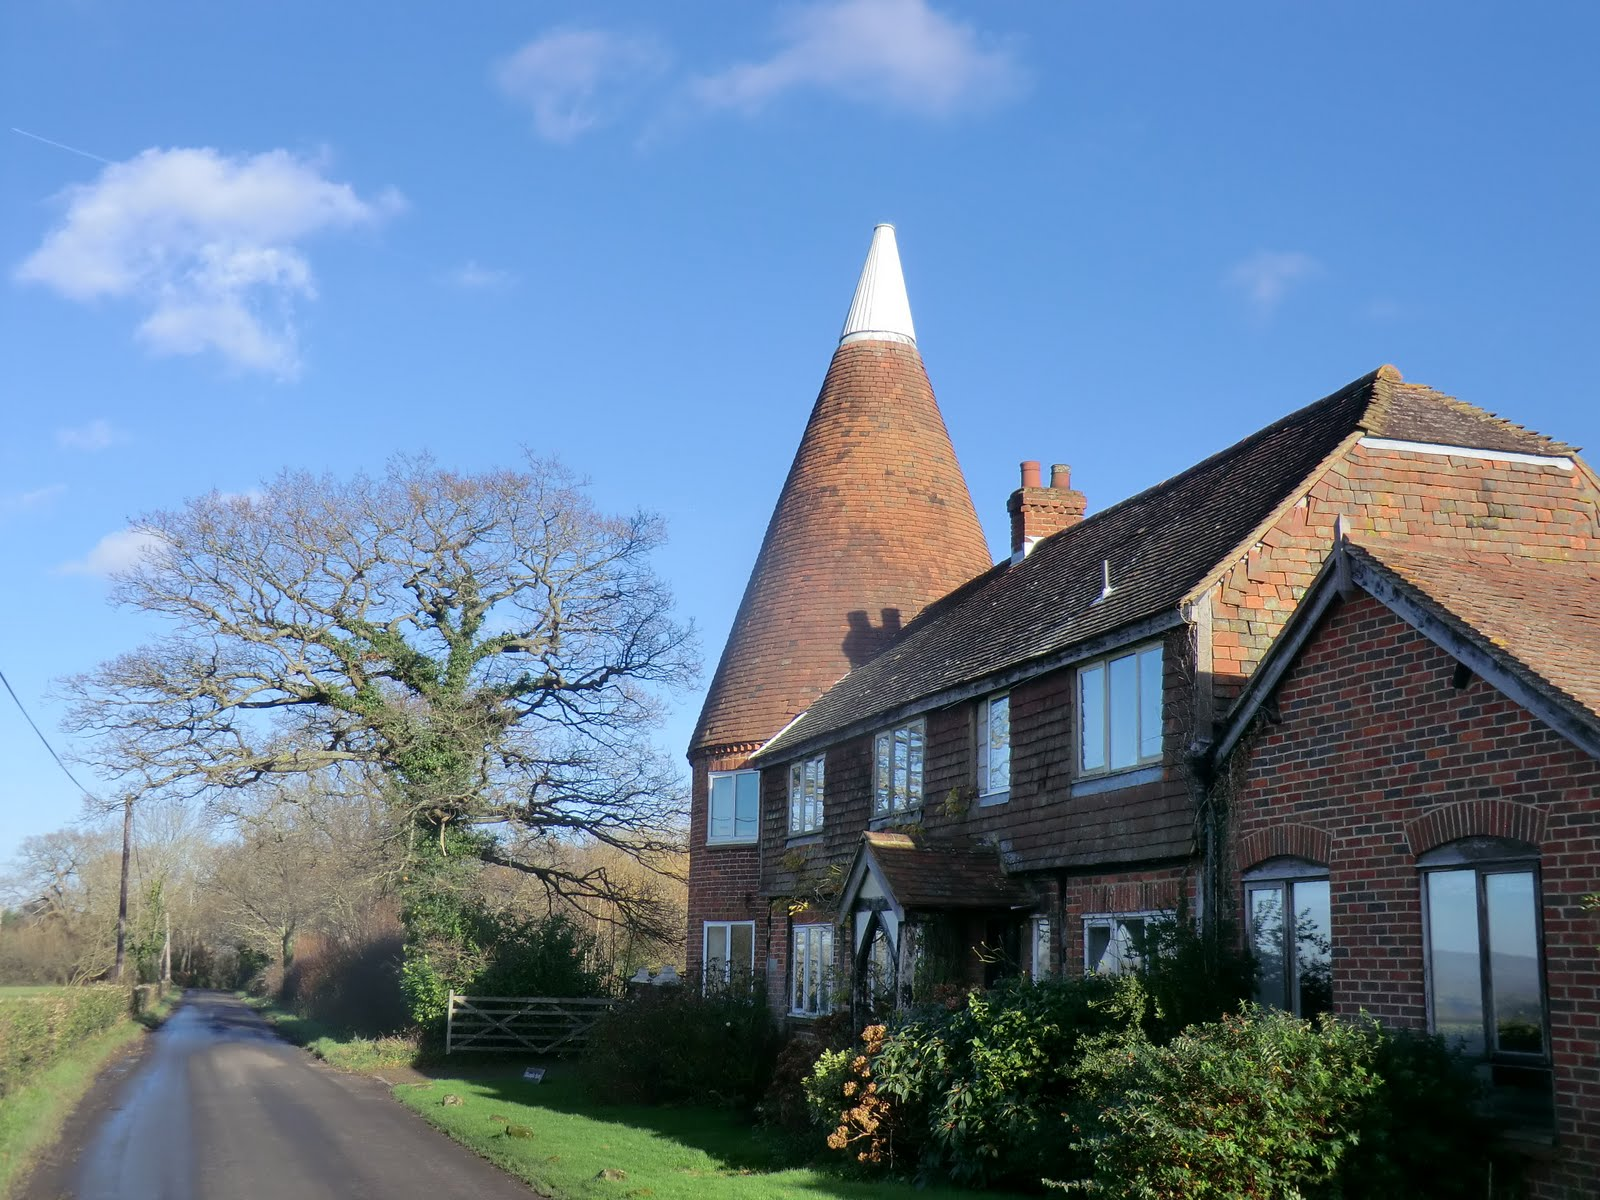 CIMG1809 Silcocks Farm on Old House Lane